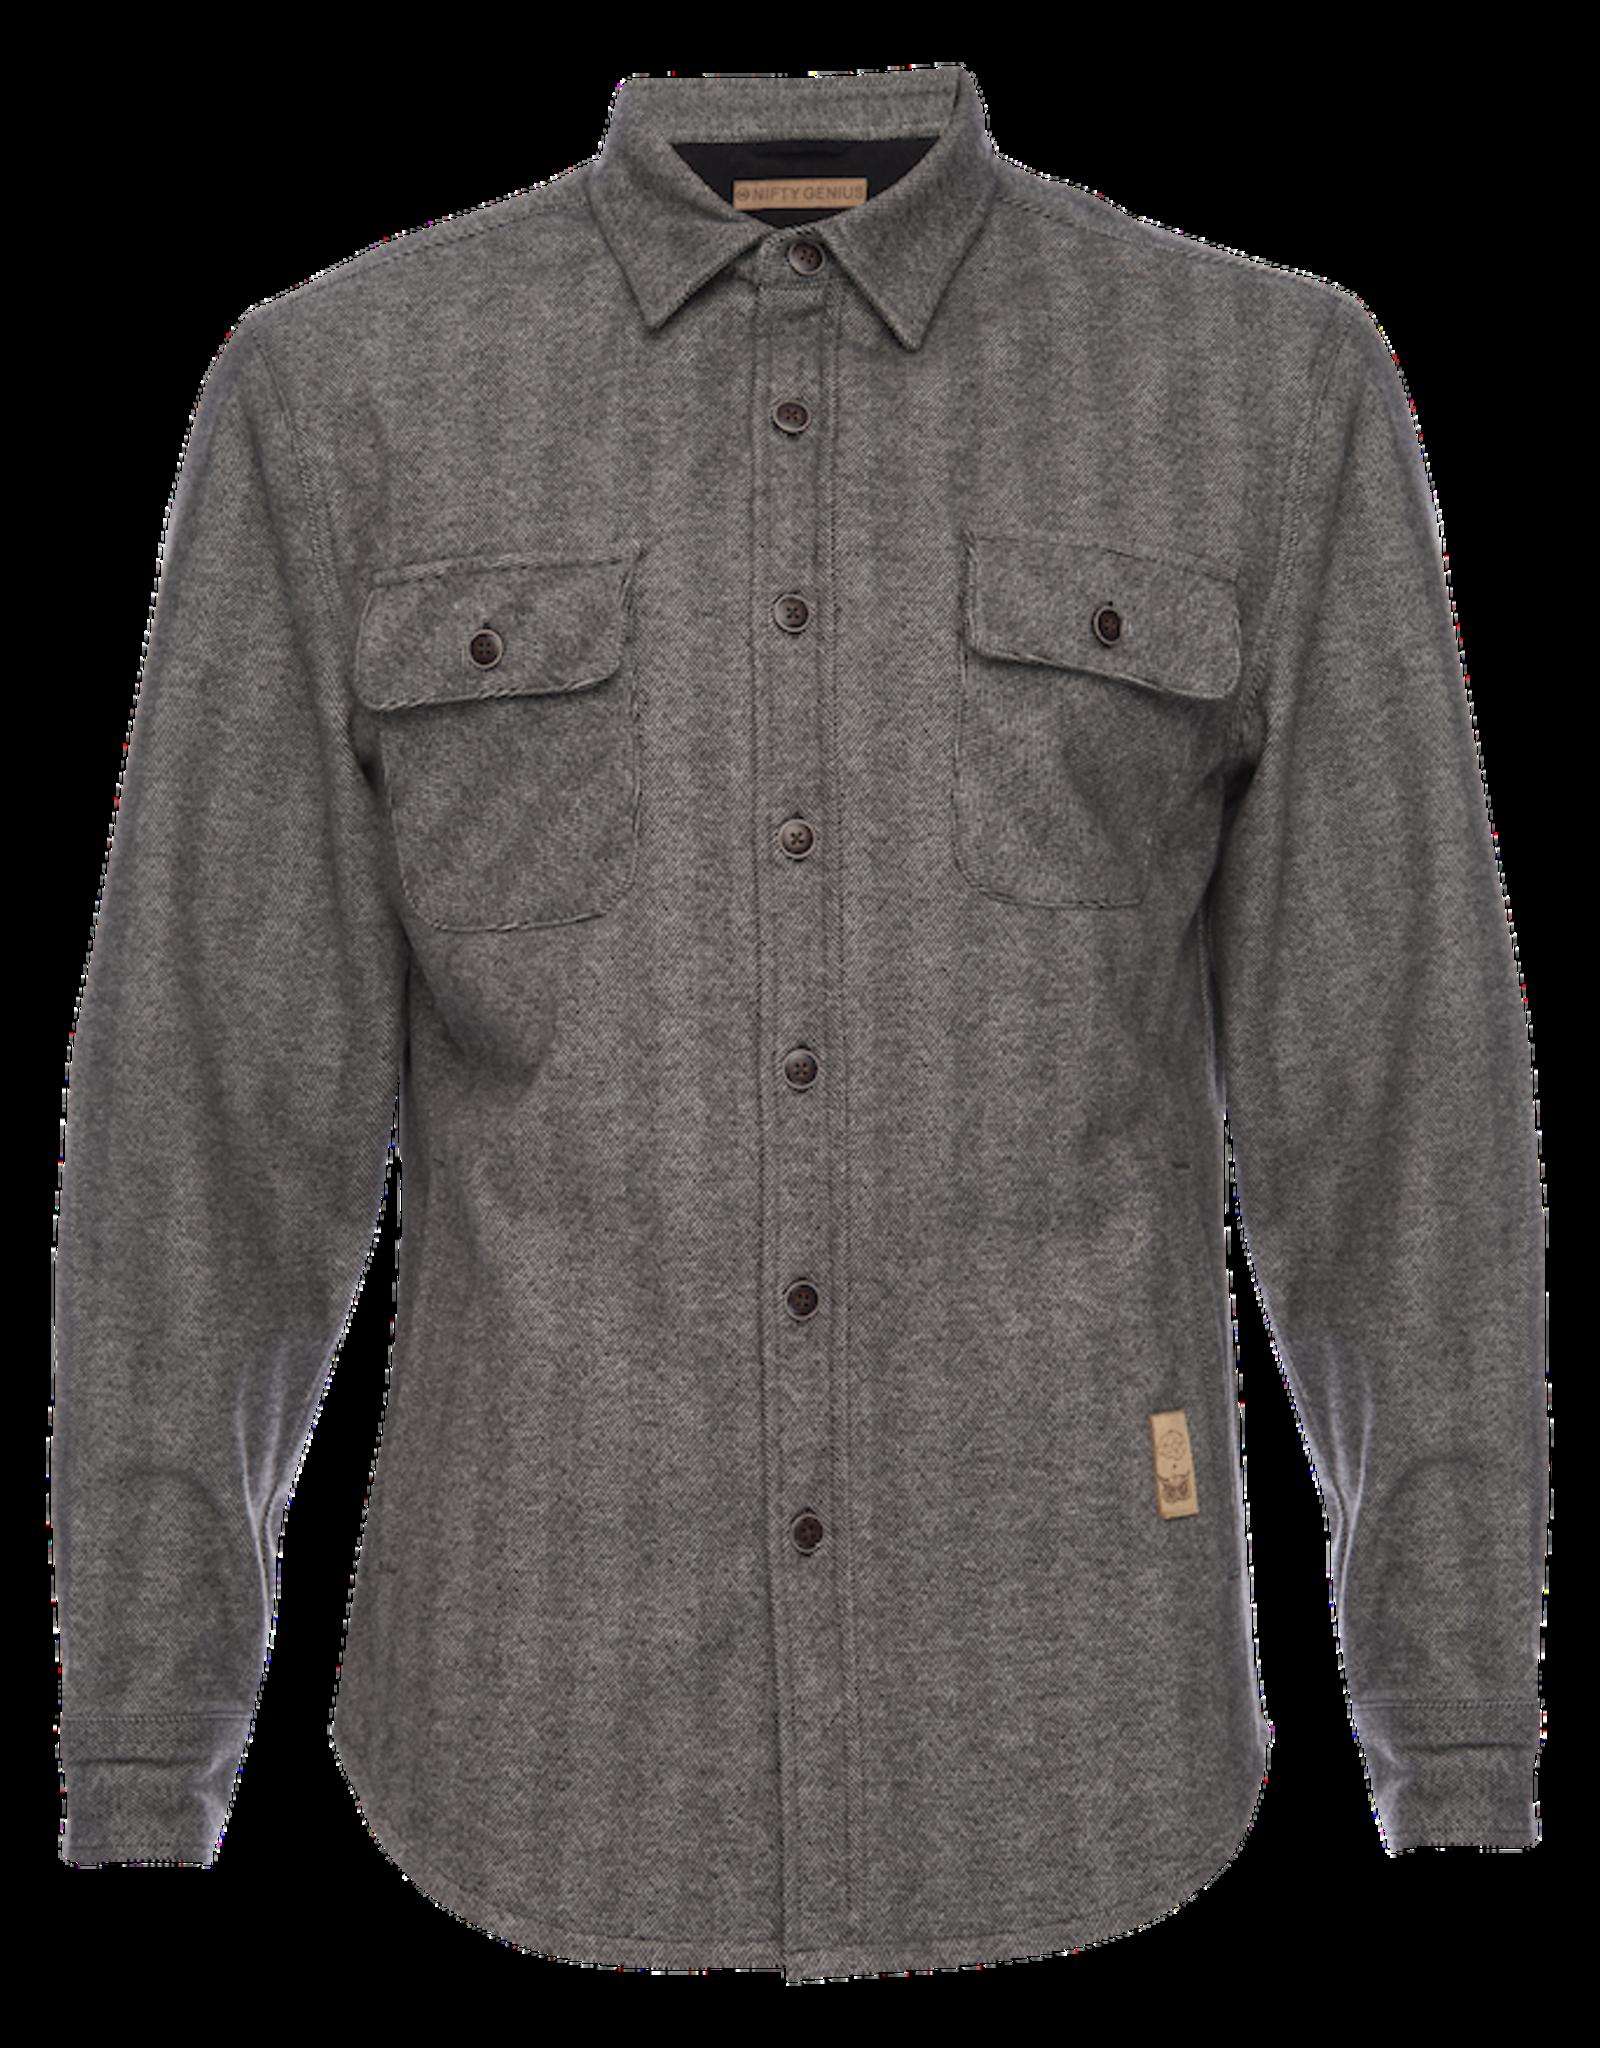 Nifty Genius CPO Herringbone Jacket